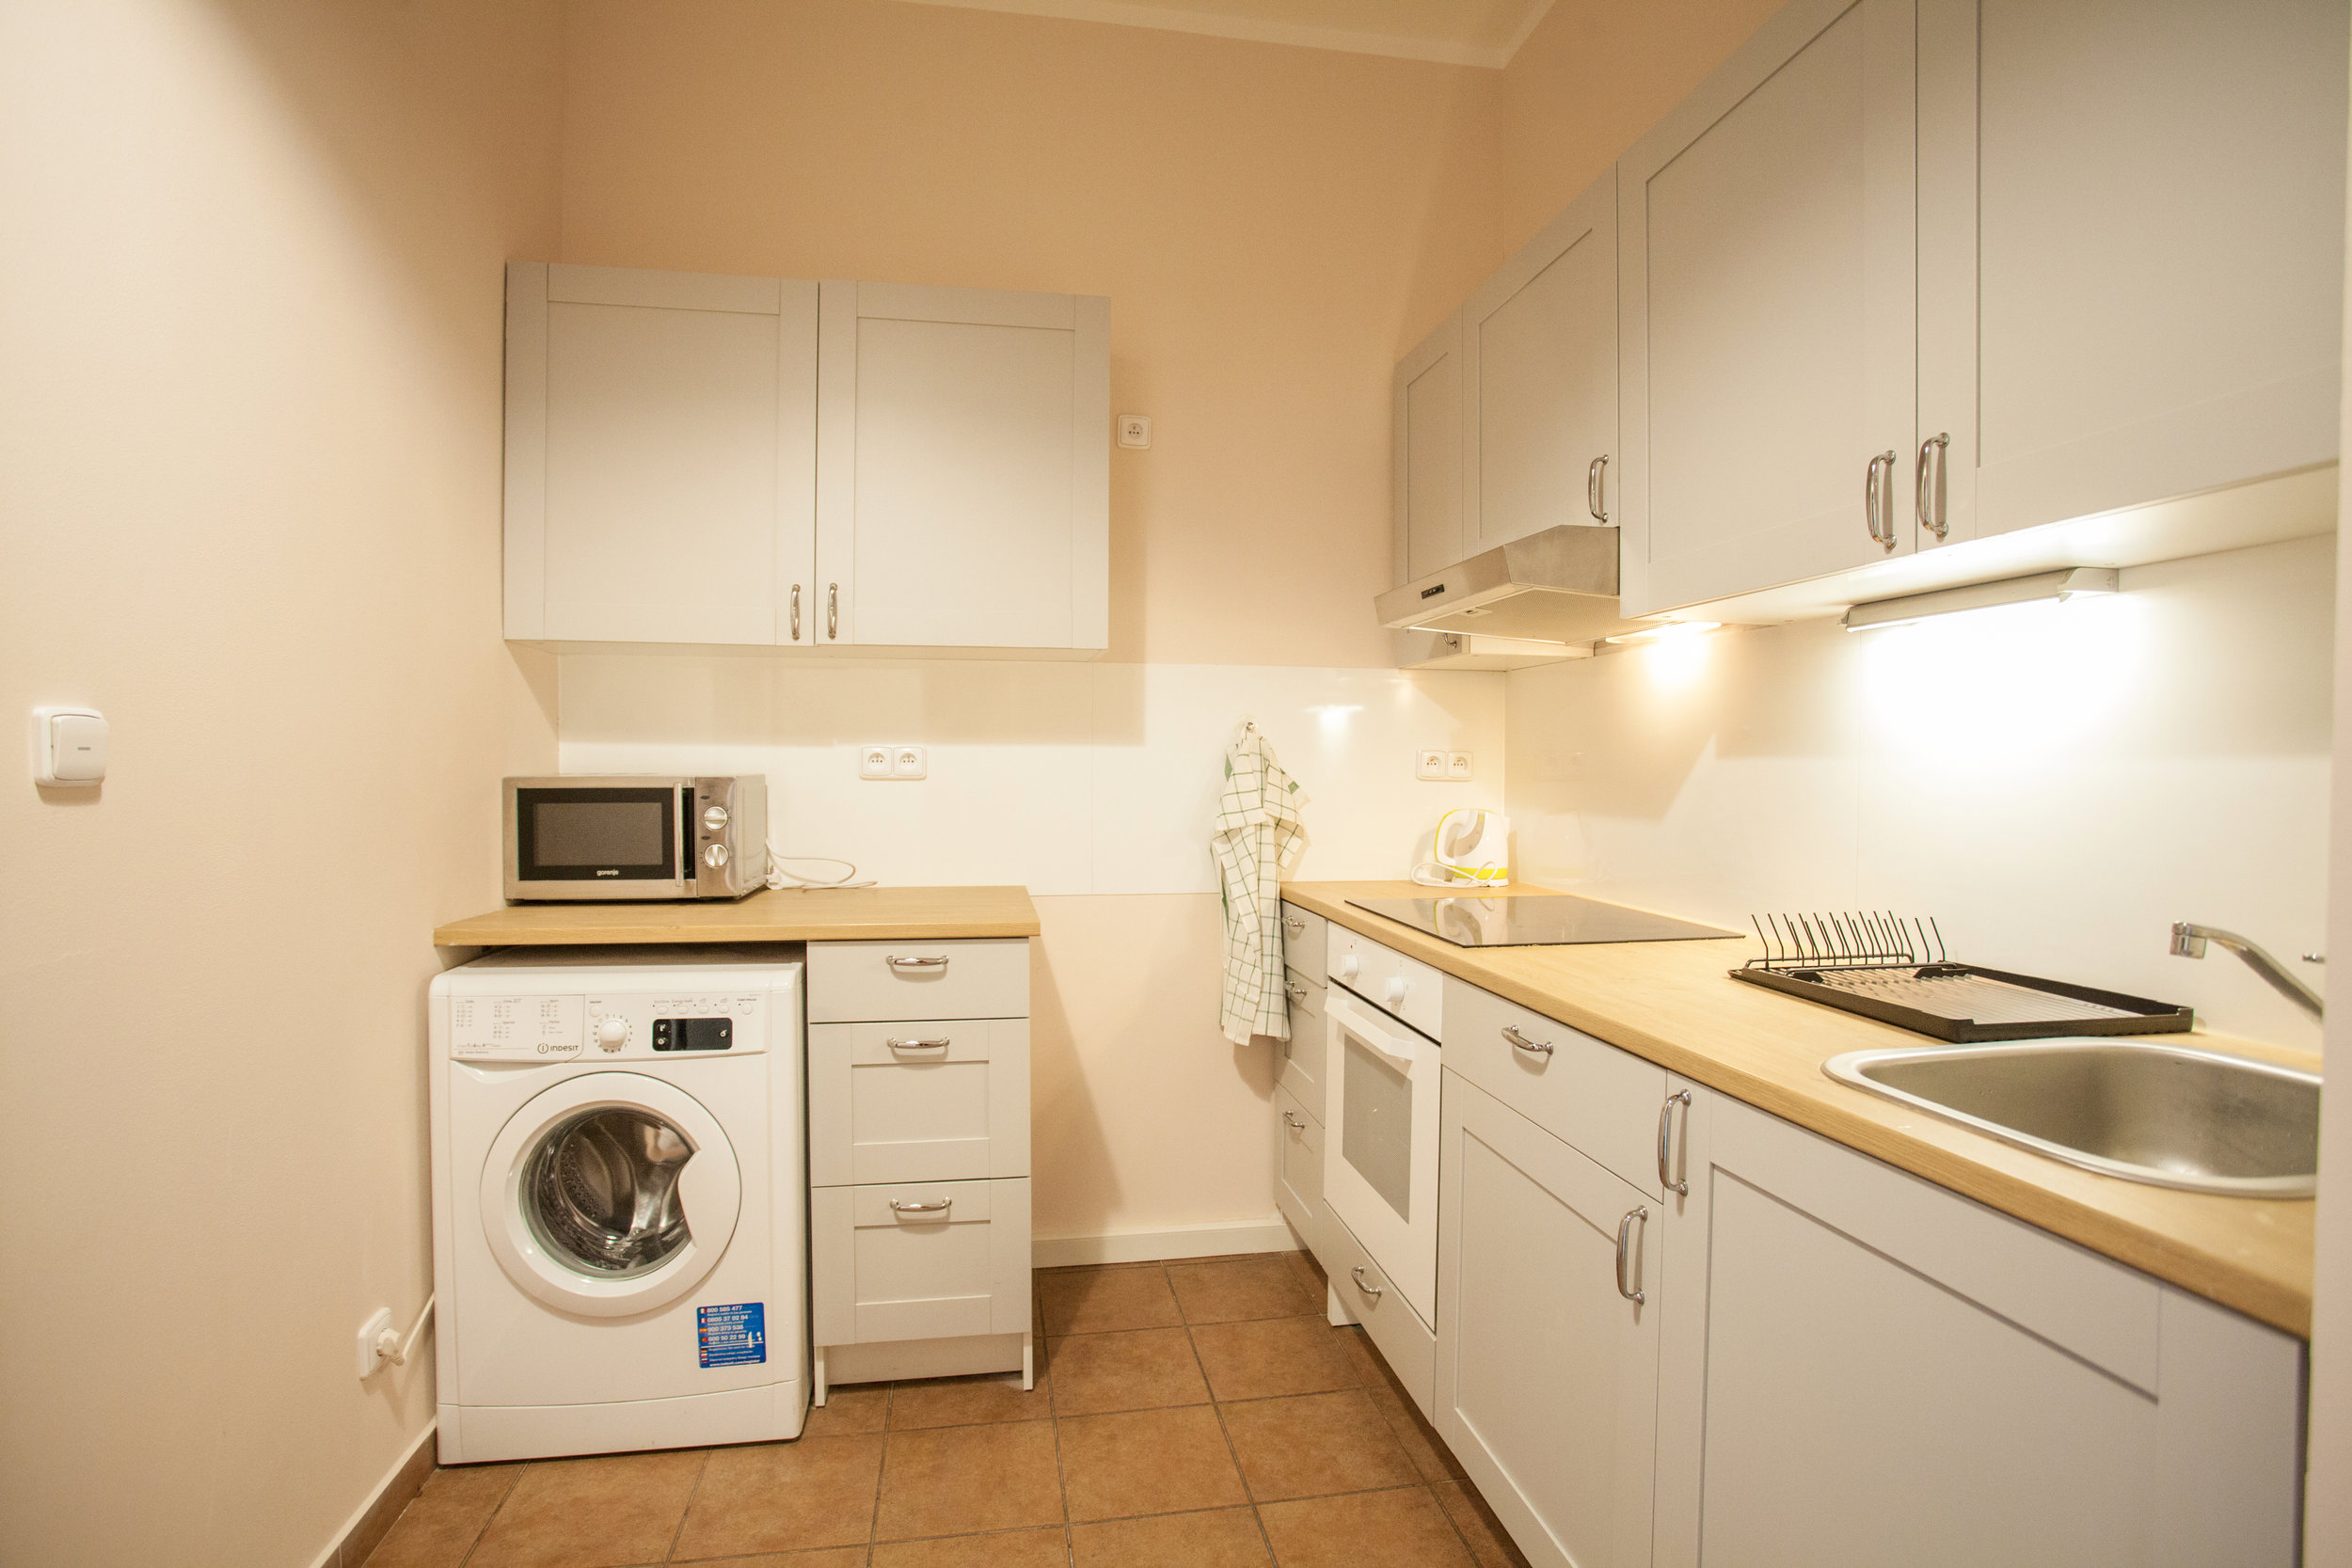 flat sharing kitchen Osadni 25.jpg